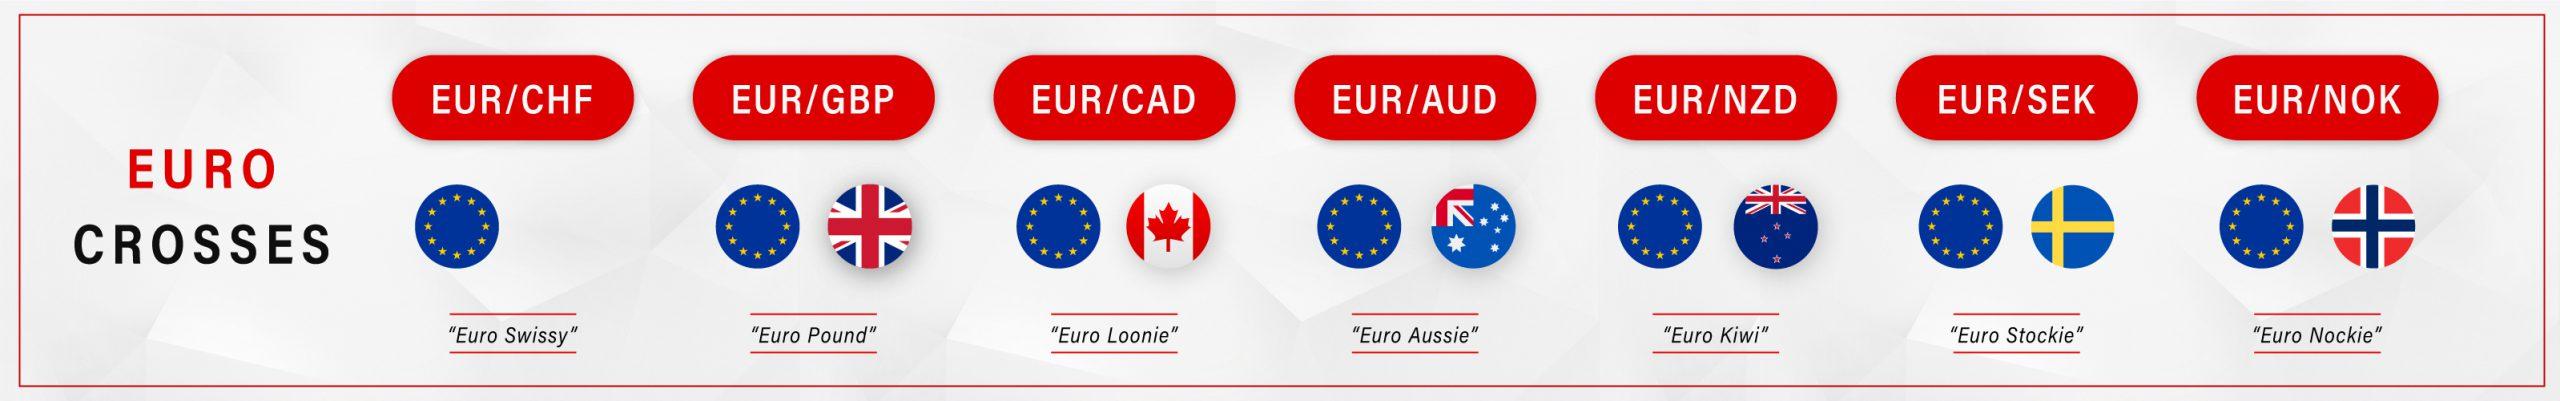 Euro Crosses